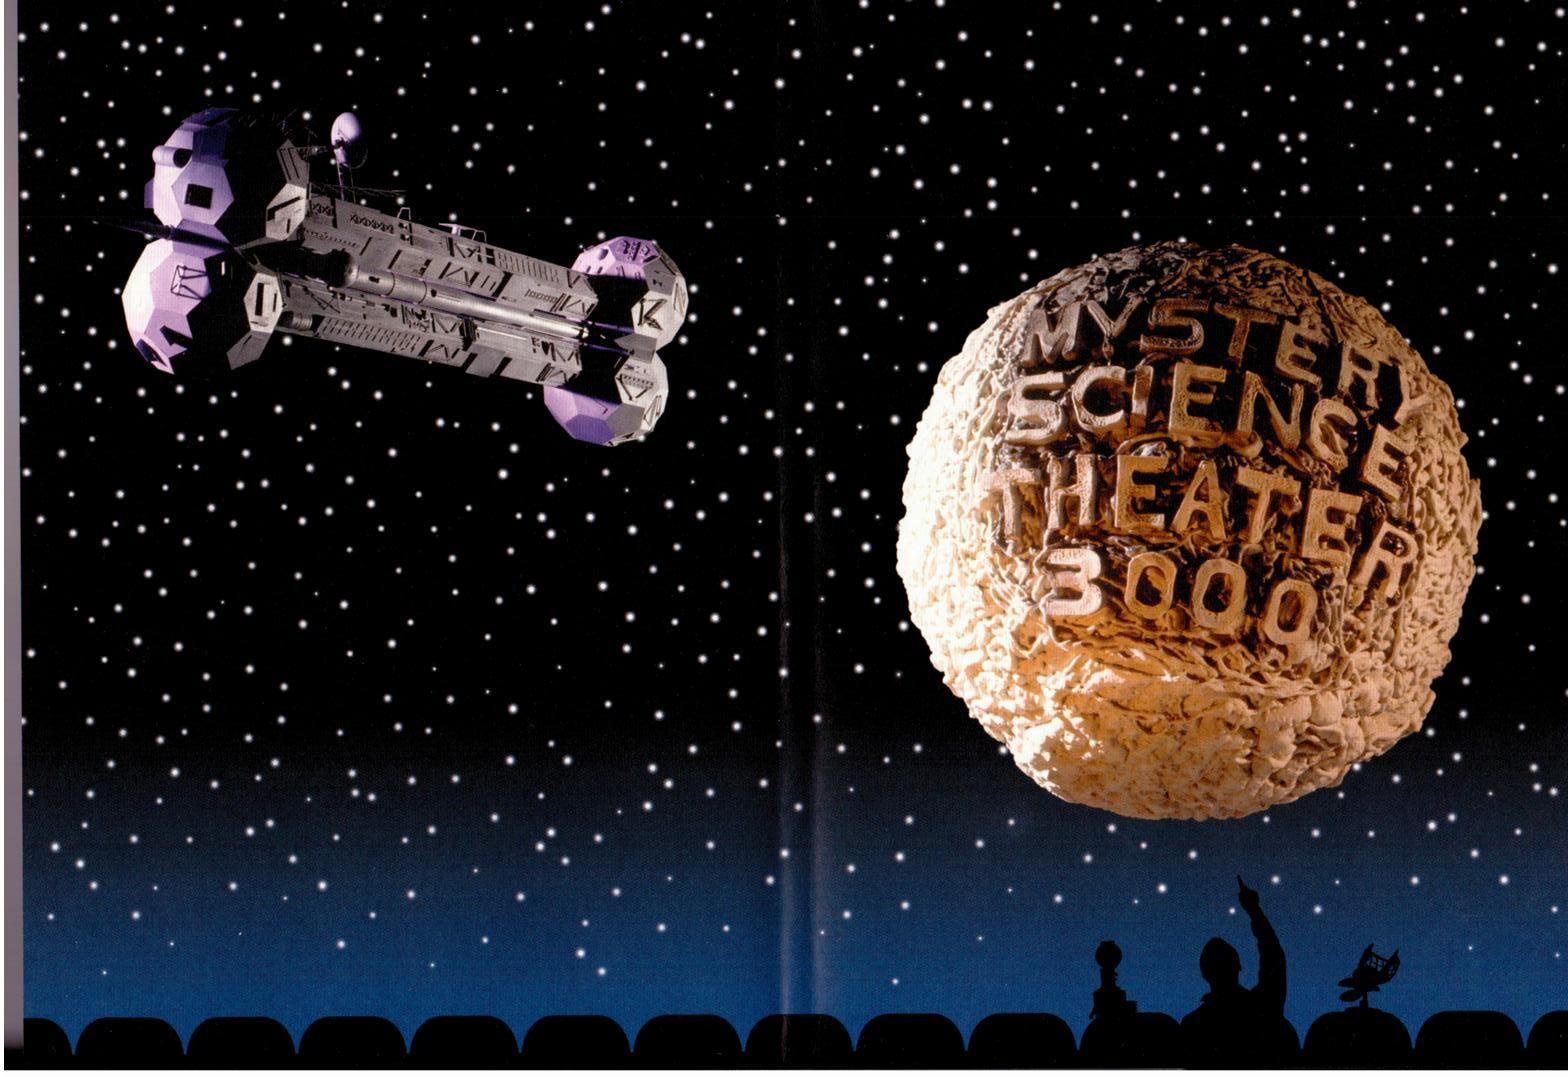 Mst3k Wallpaper Odd Names Mystery Science Sci Fi